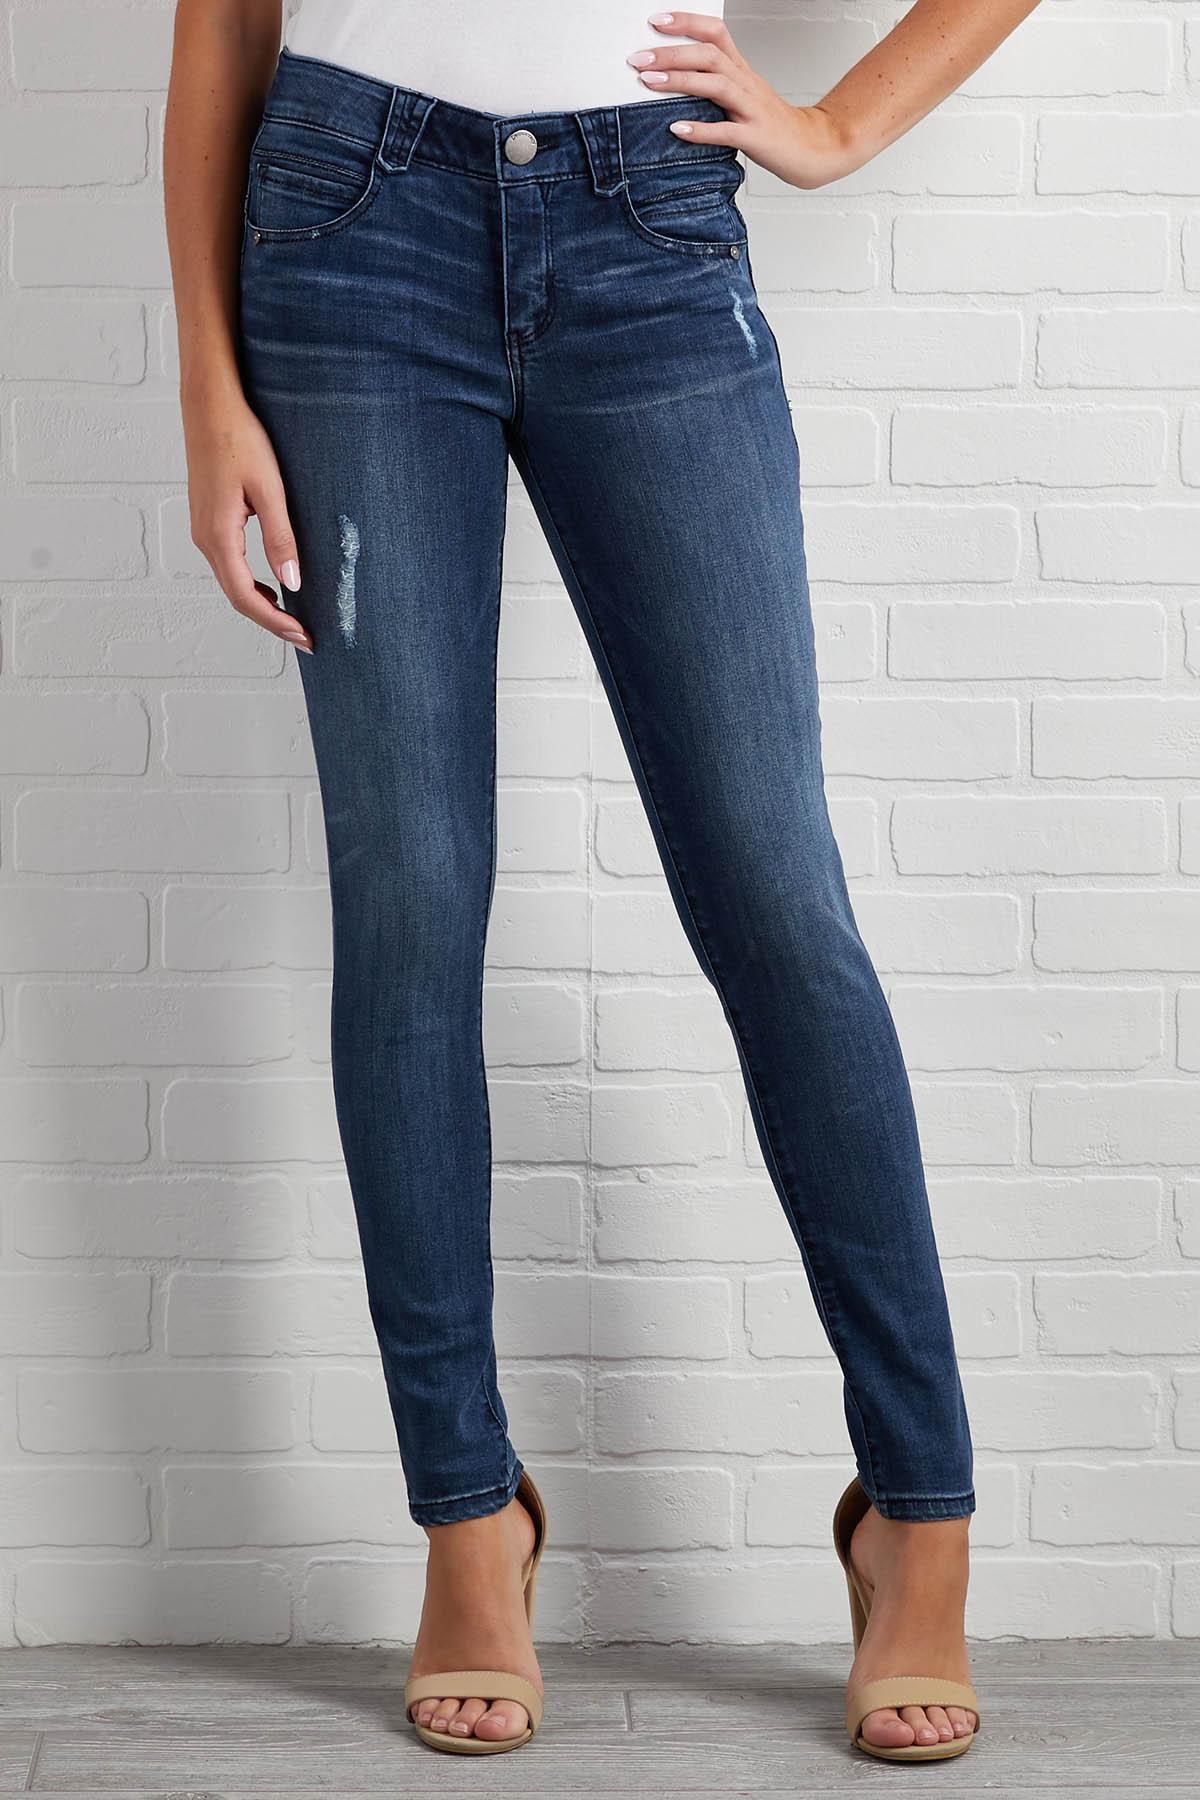 Something Subtle Distressed Jeans